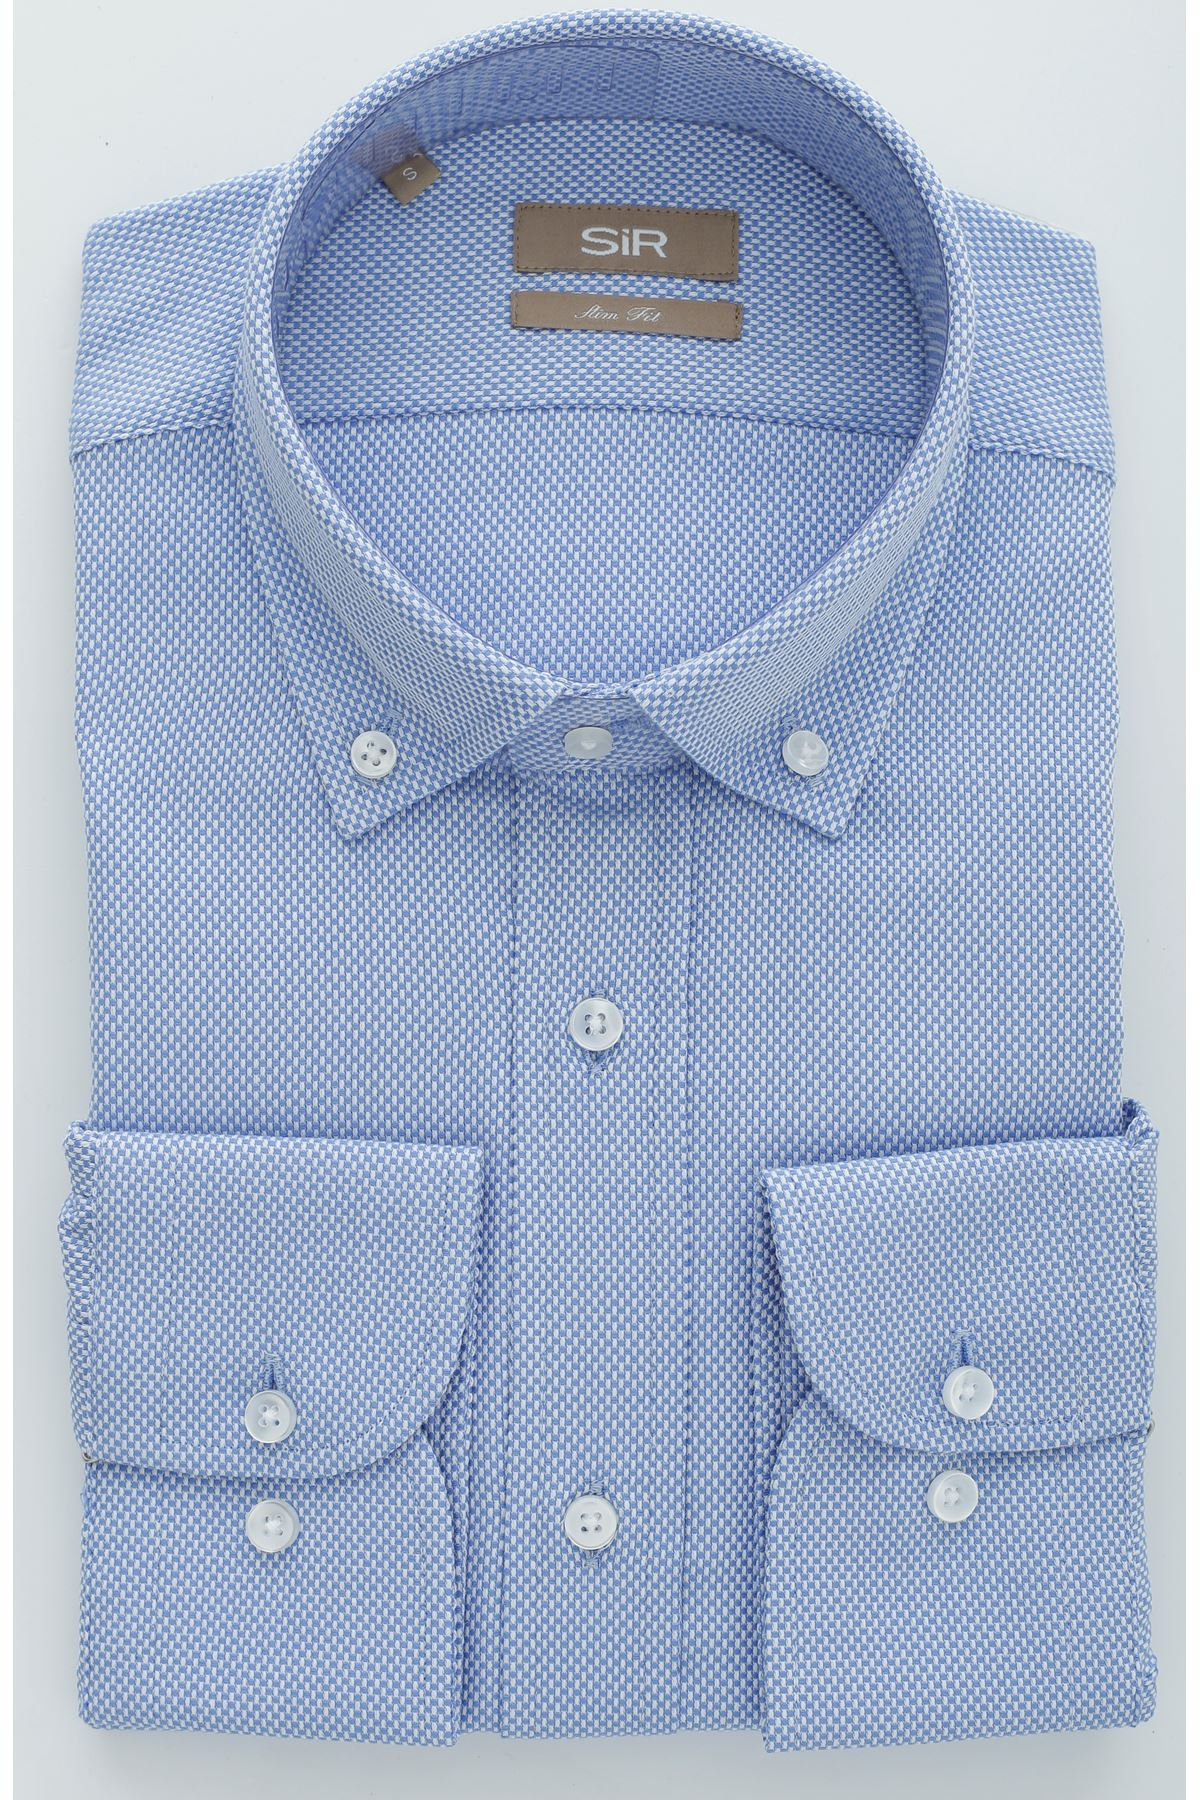 Mavi Dokulu Slim Gömlek